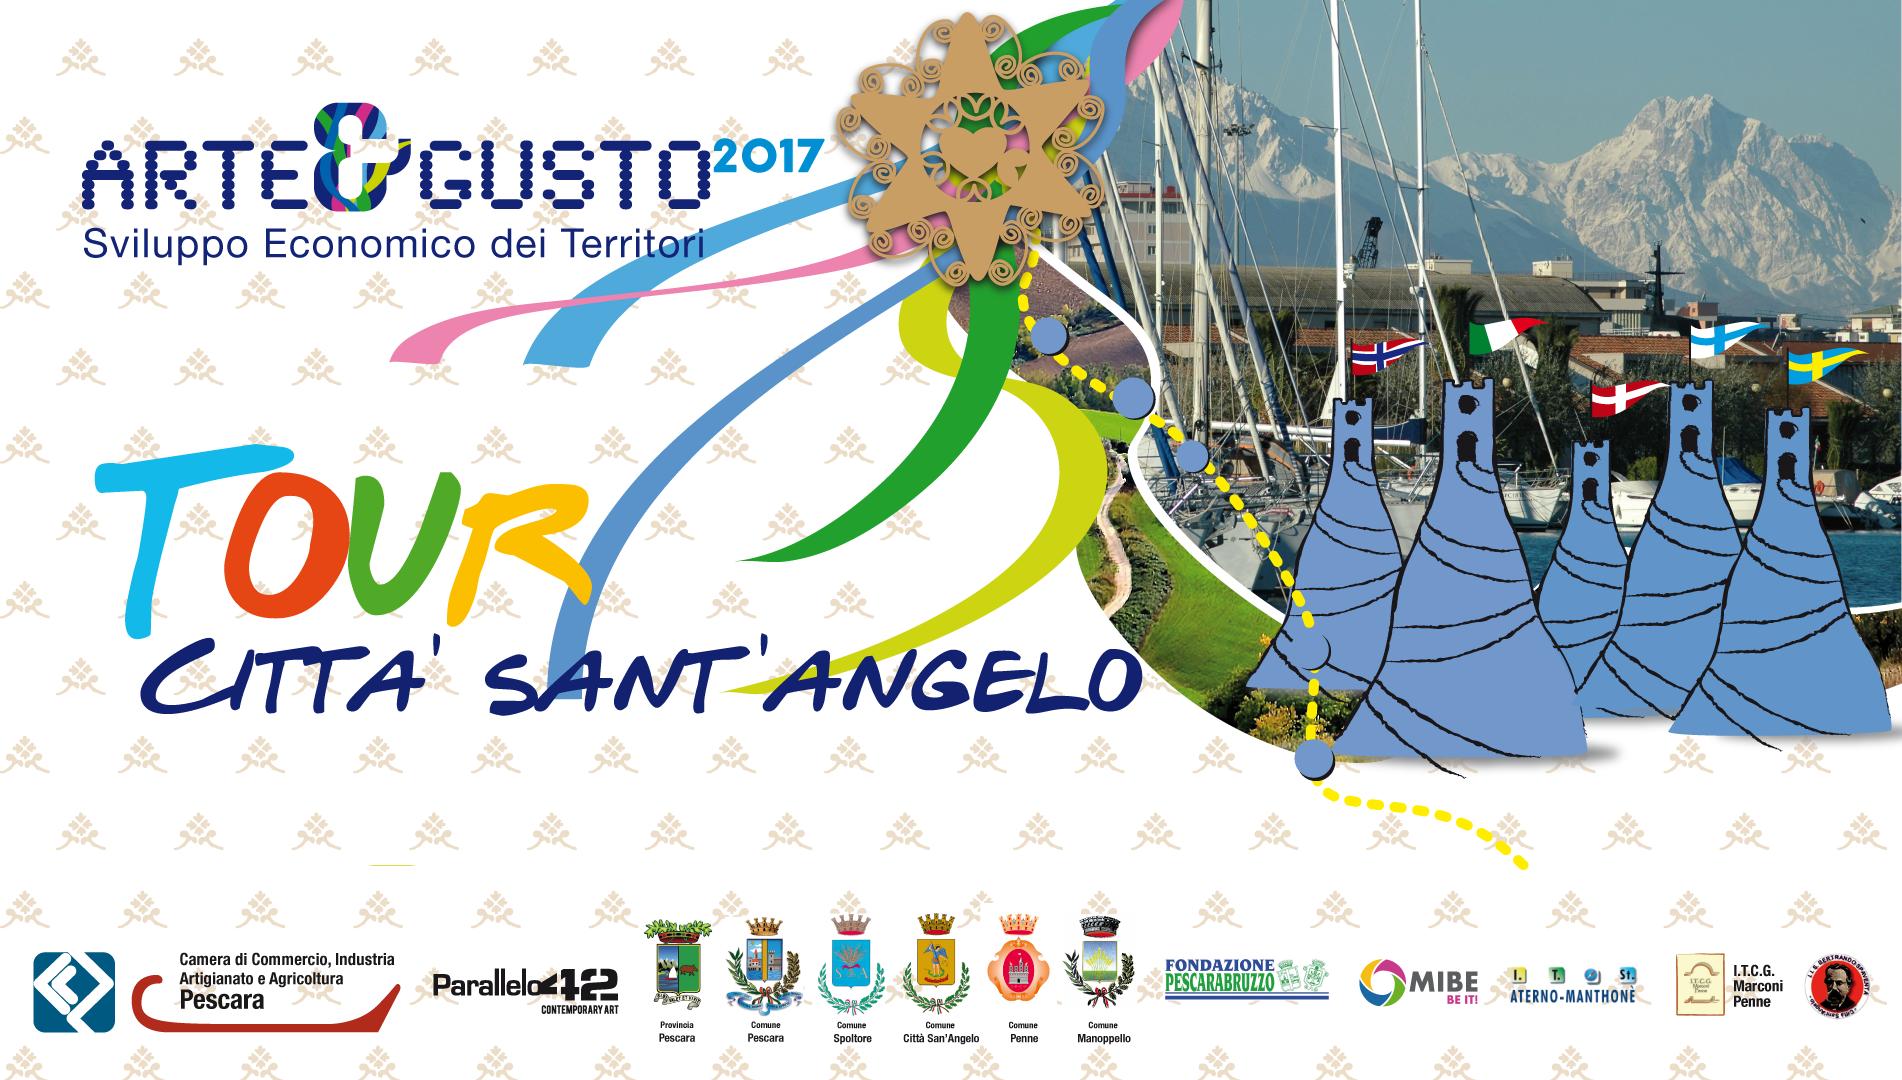 A&G 2017 Copertina-tour-citta santangelo